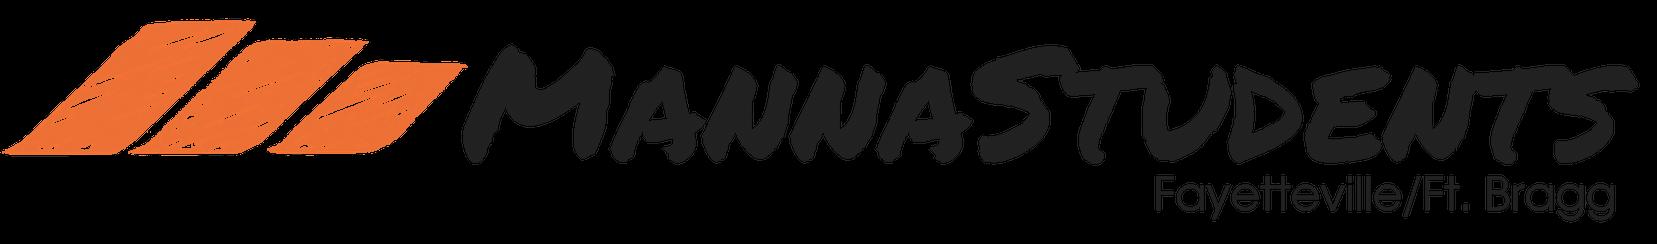 Manna Church Students Logo